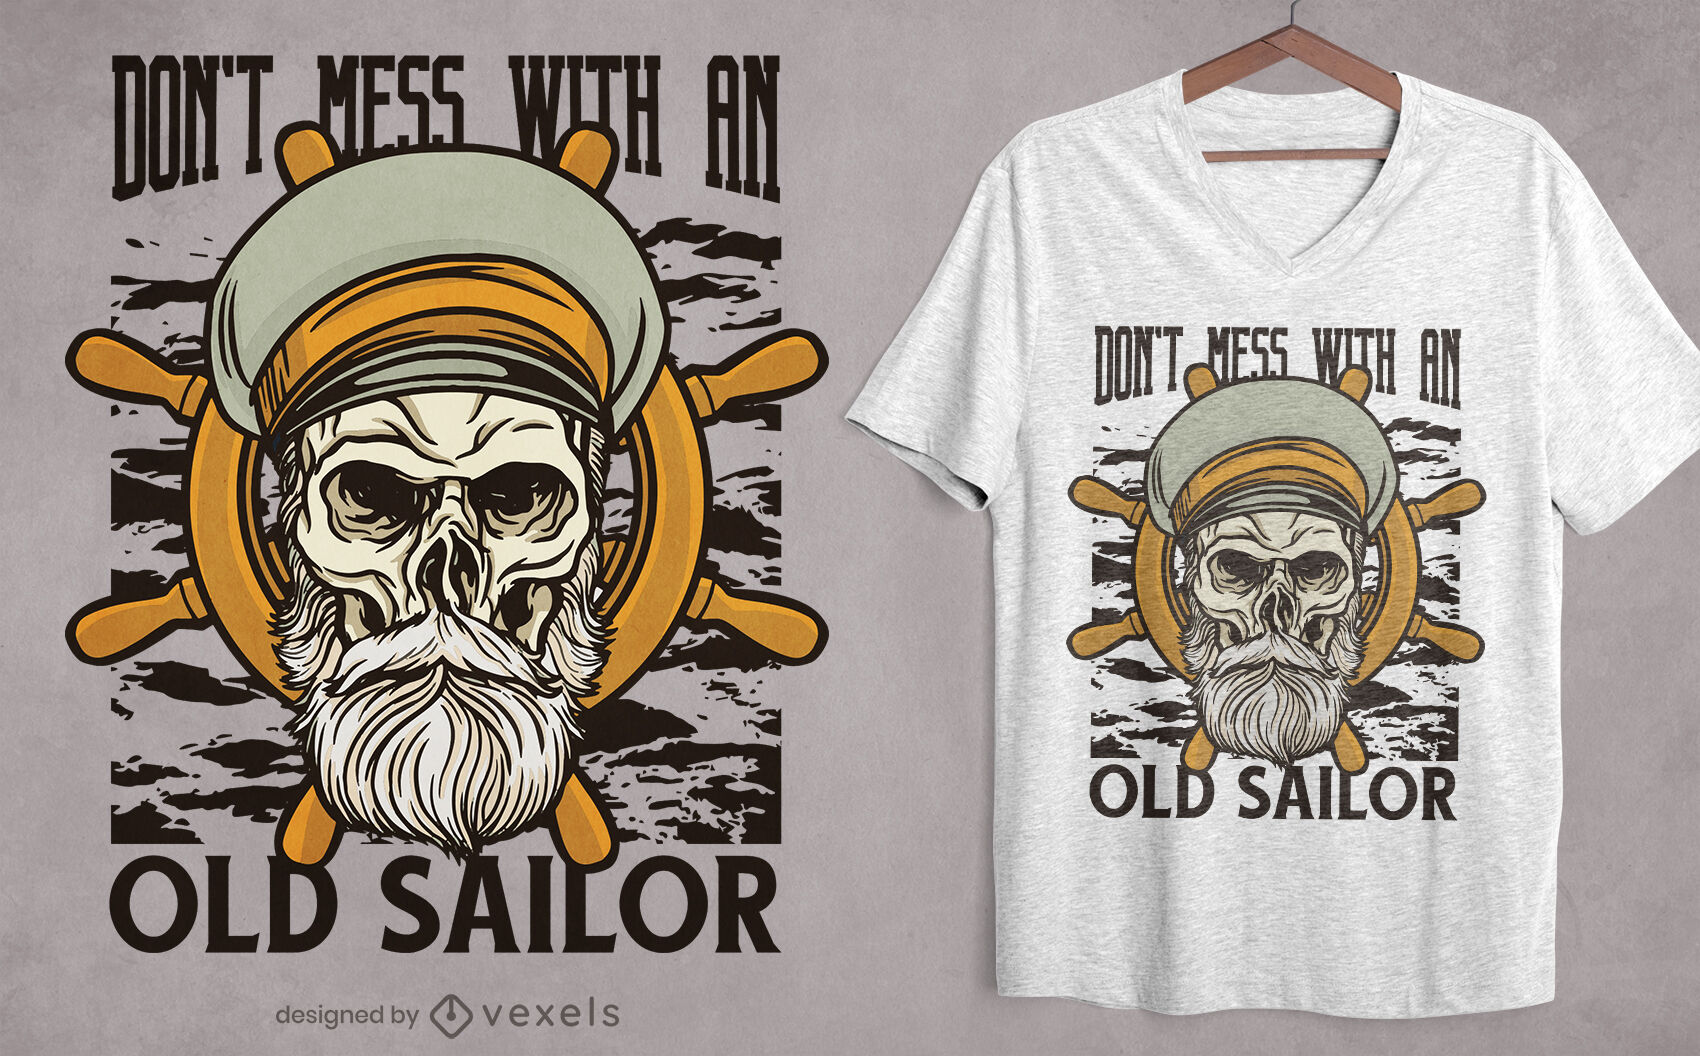 Sailor skull illustration t-shirt design